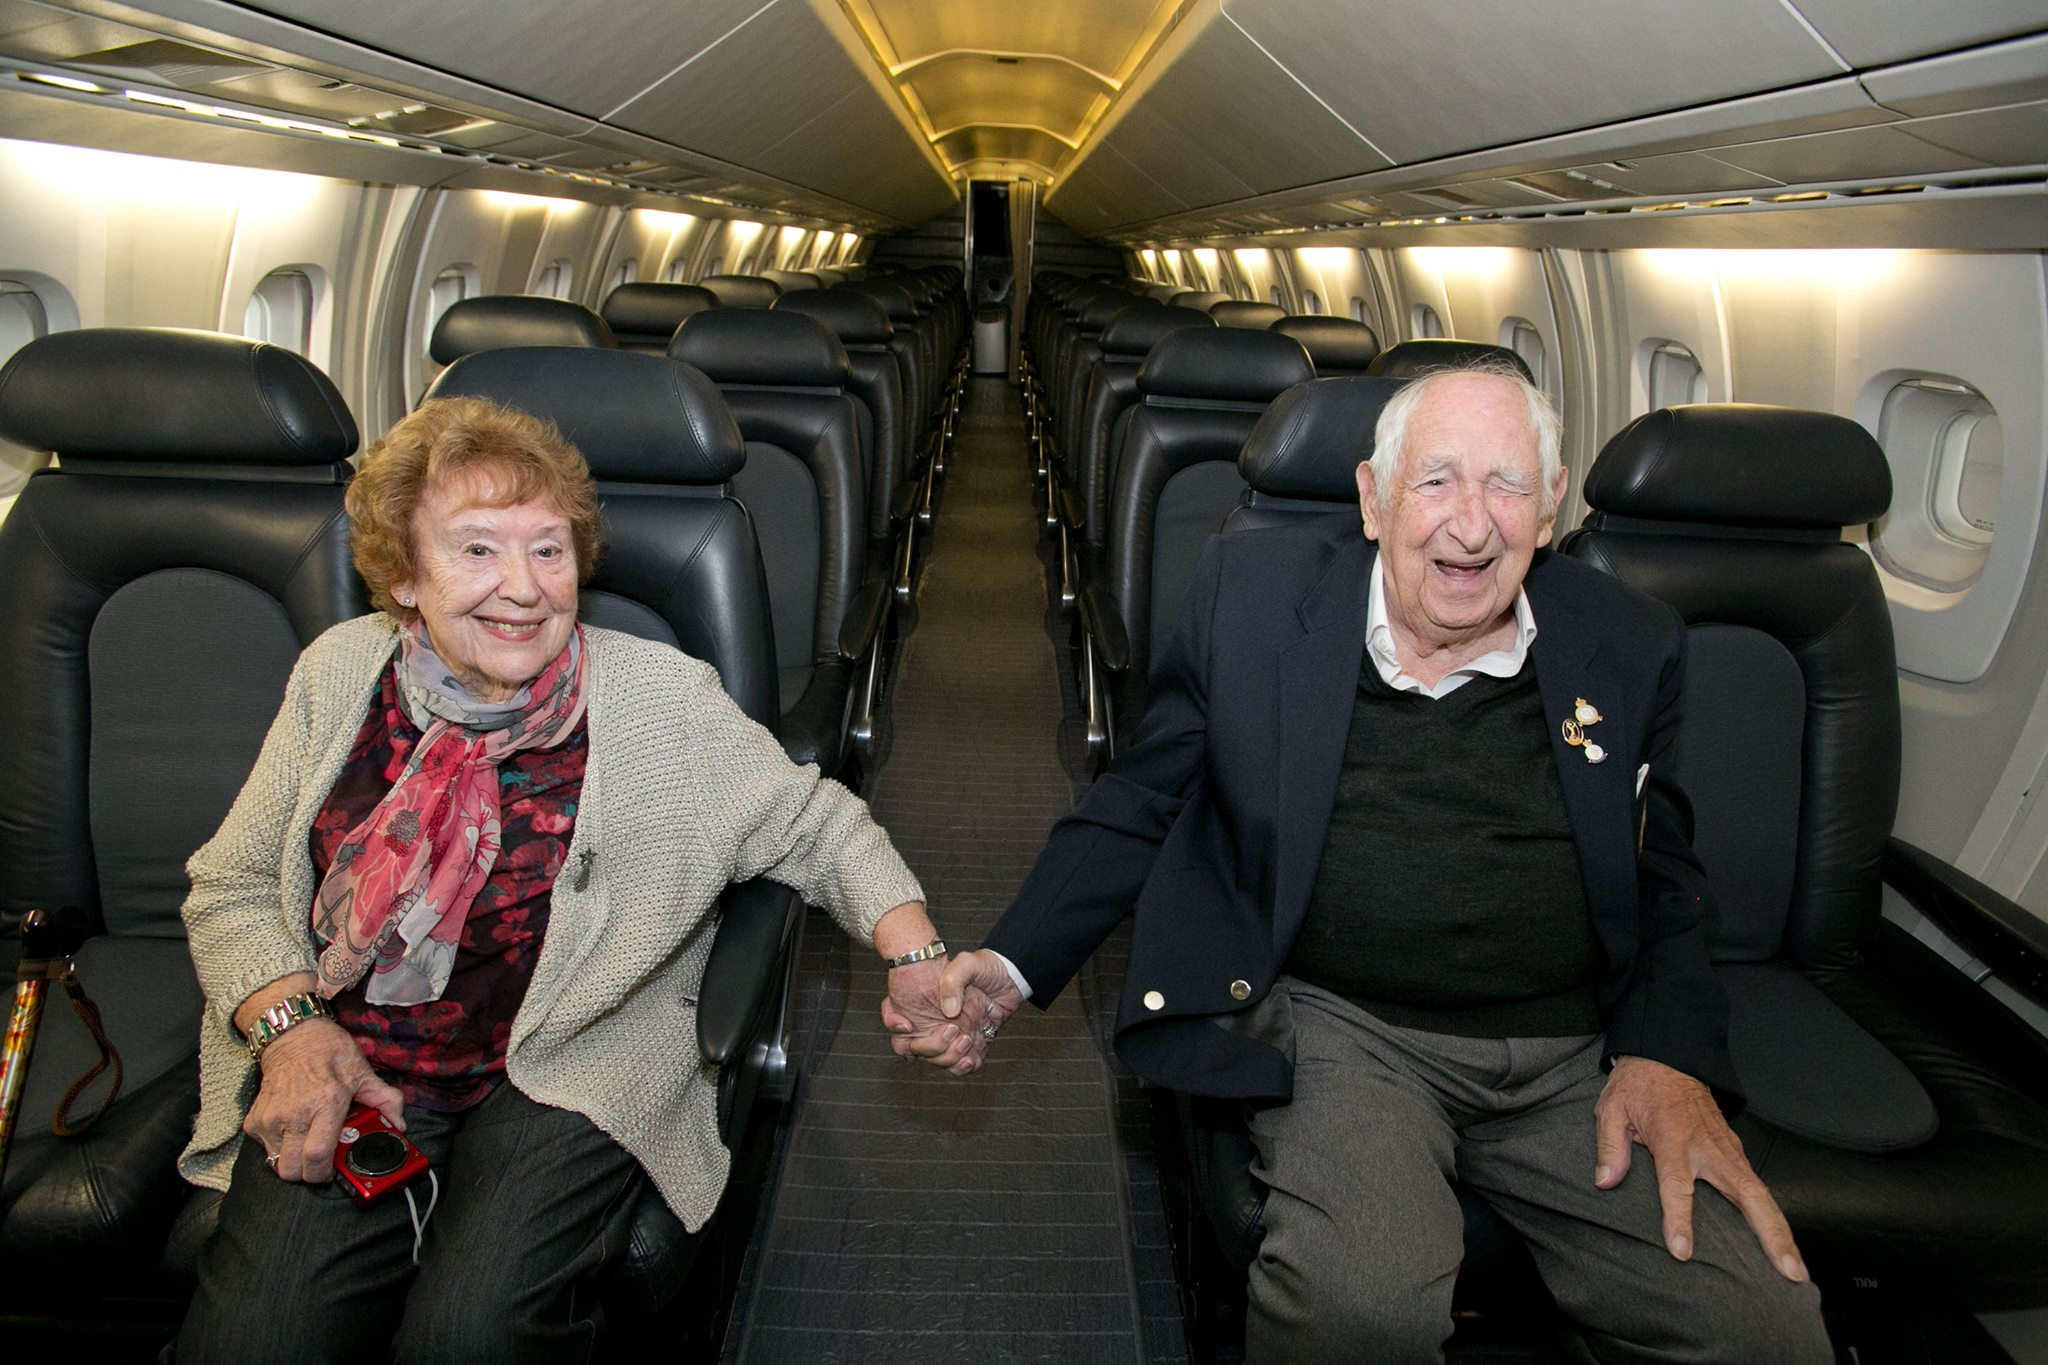 Concorde tours Main